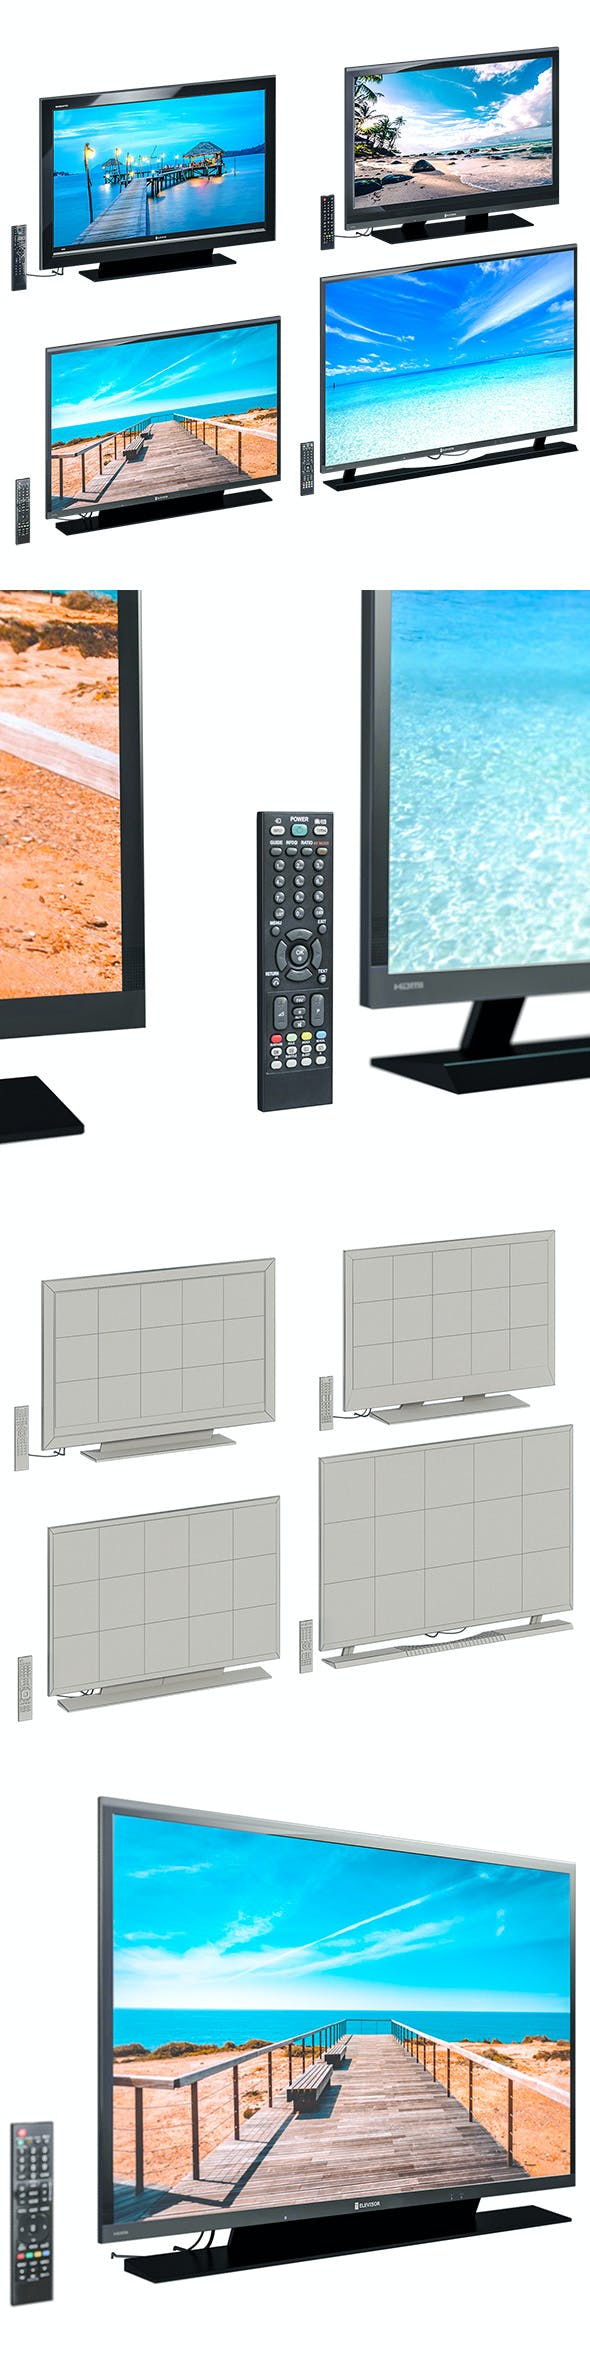 L3DV09G01 - televisors set - 3DOcean Item for Sale